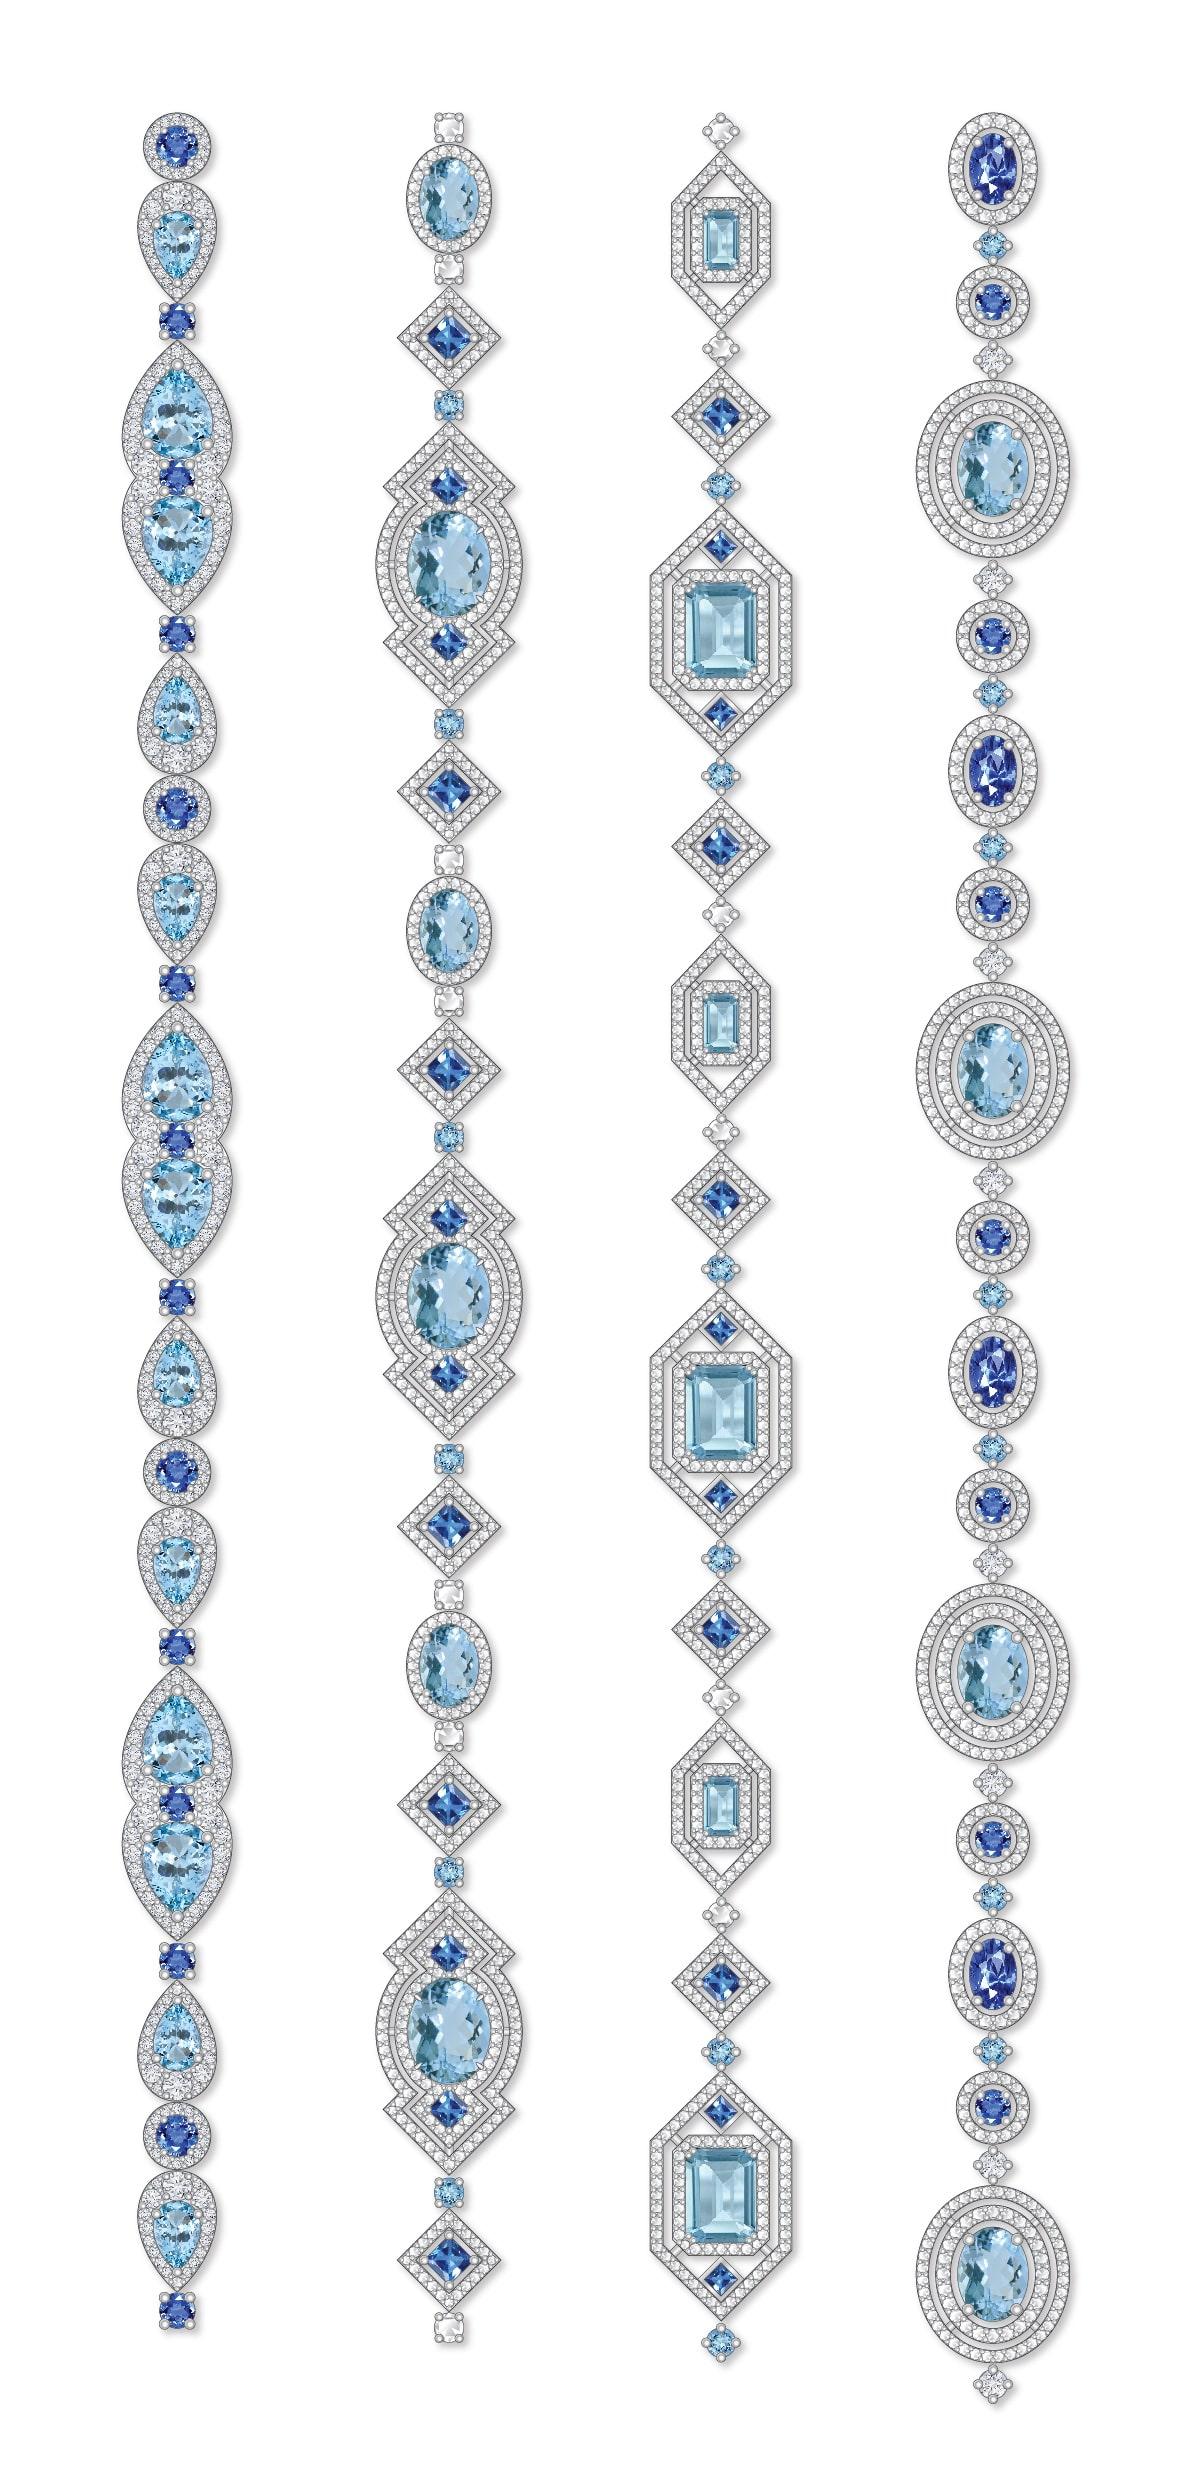 Dessins sautoirs aigue-marine saphirs diamants